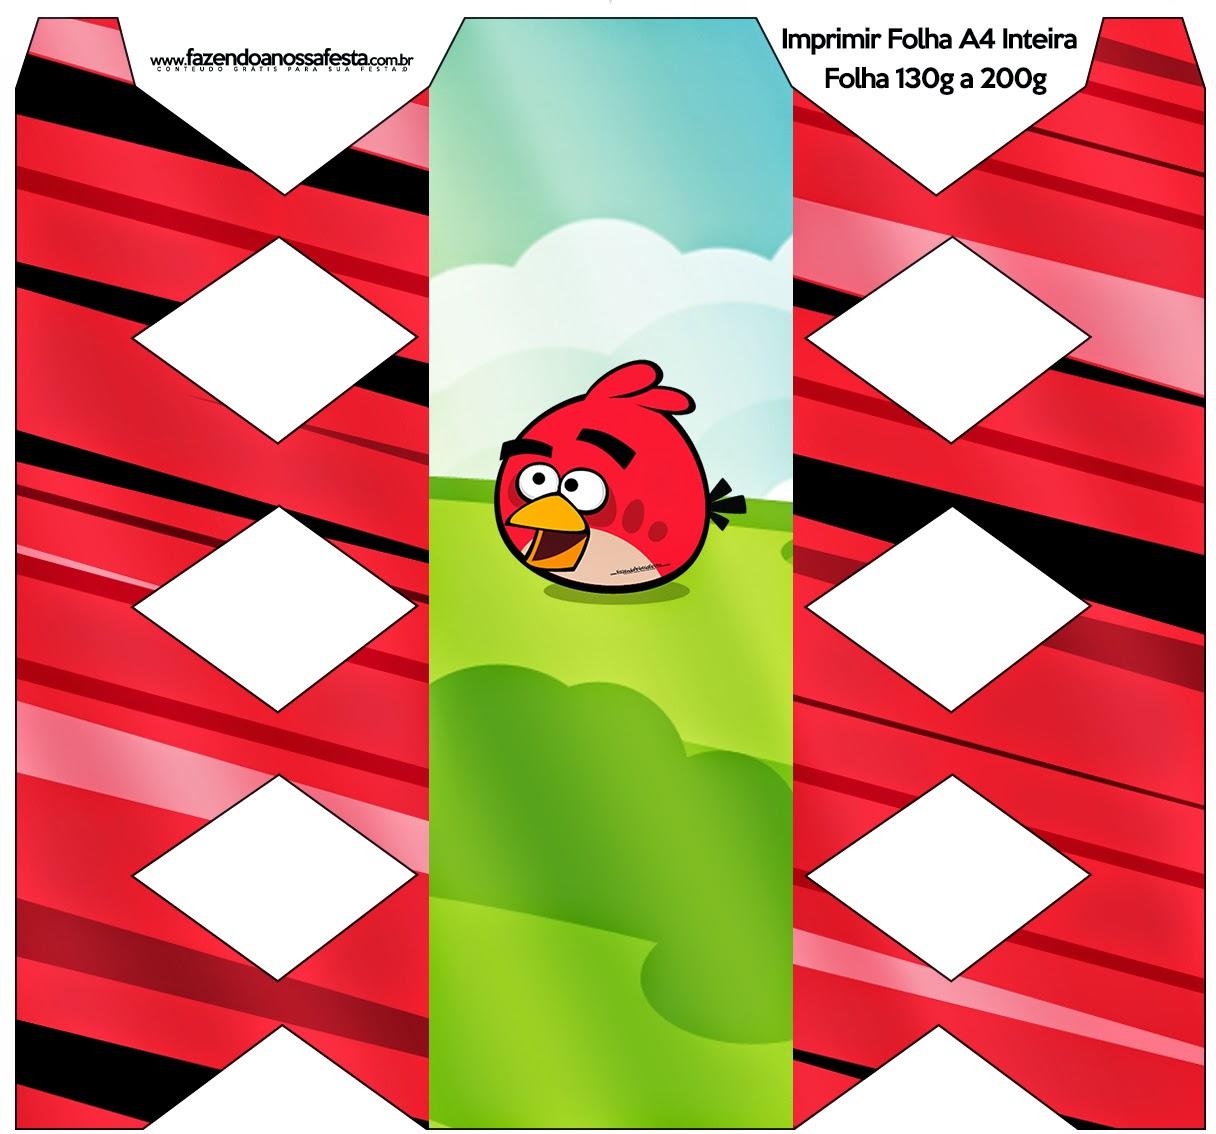 Imprimibles de Angry Birds para imprimir gratis.